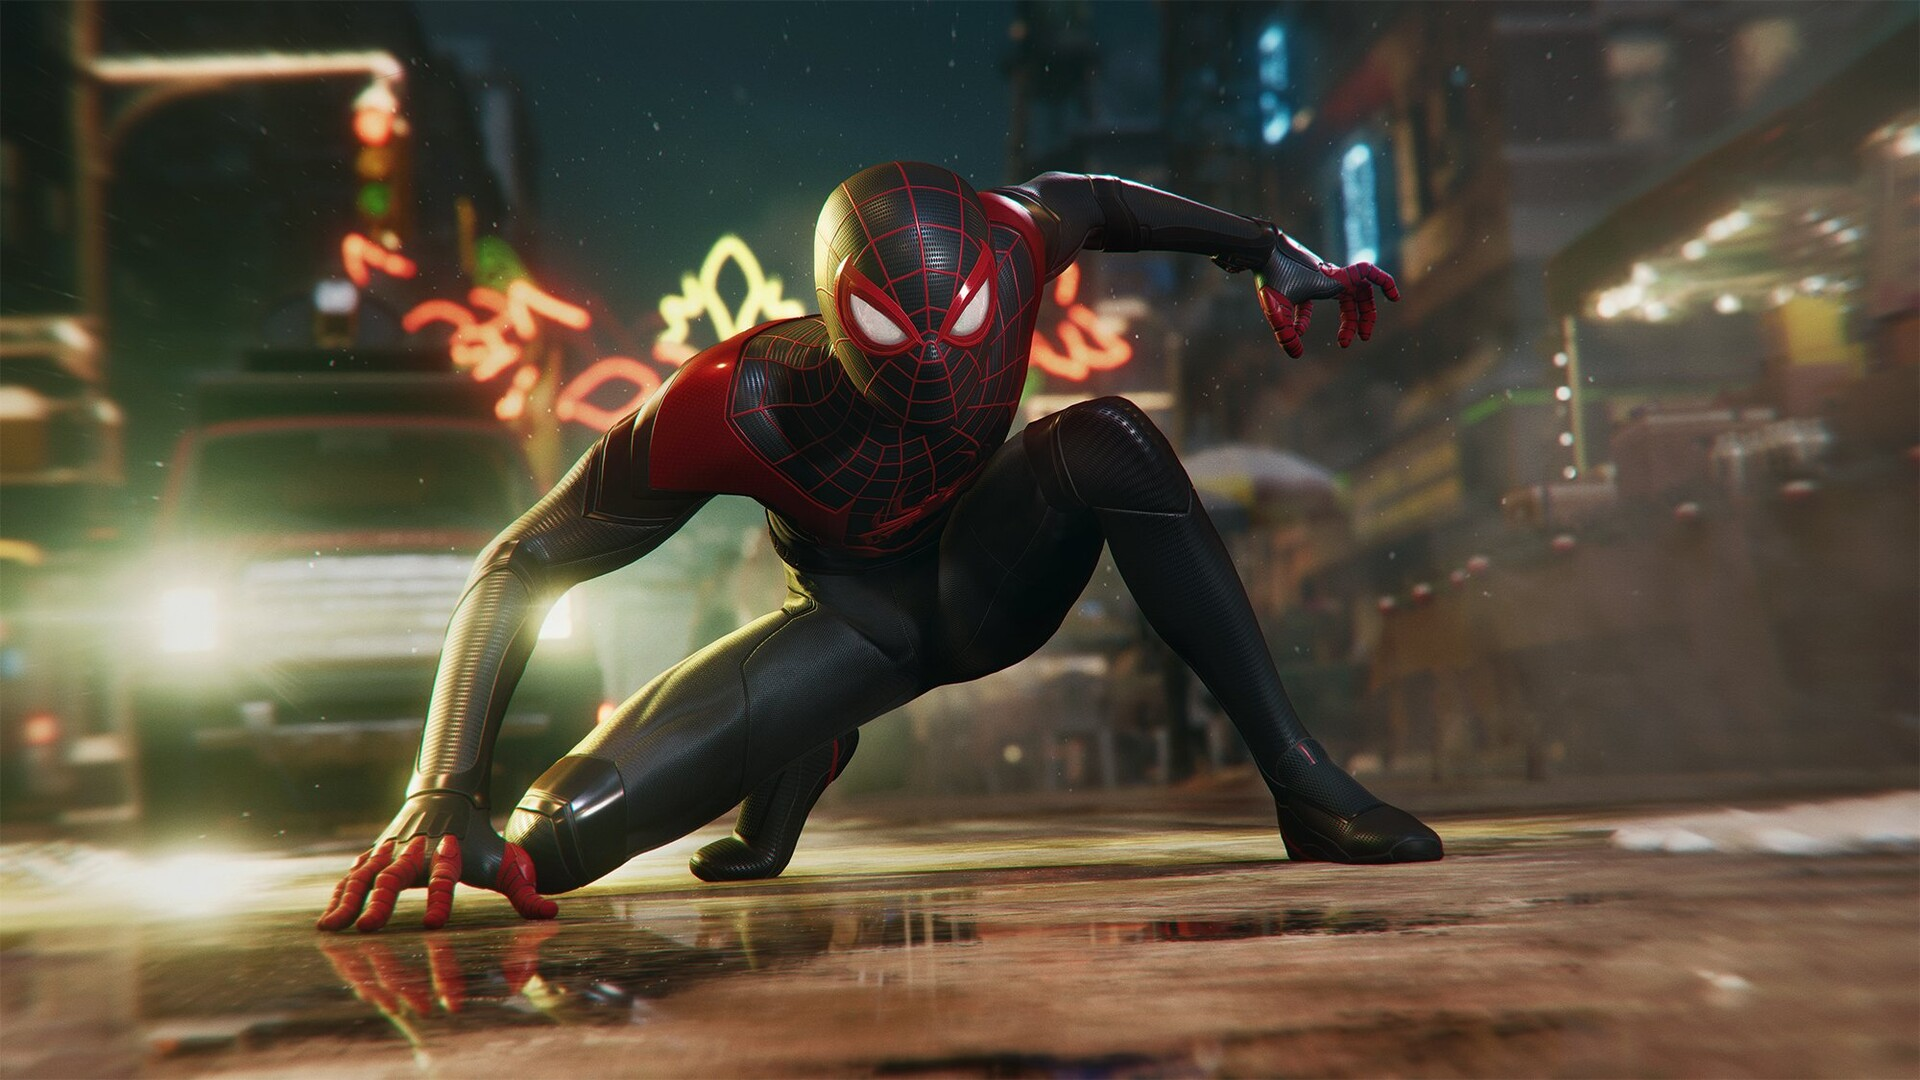 marvels spider man miles morales wallpaper 72401